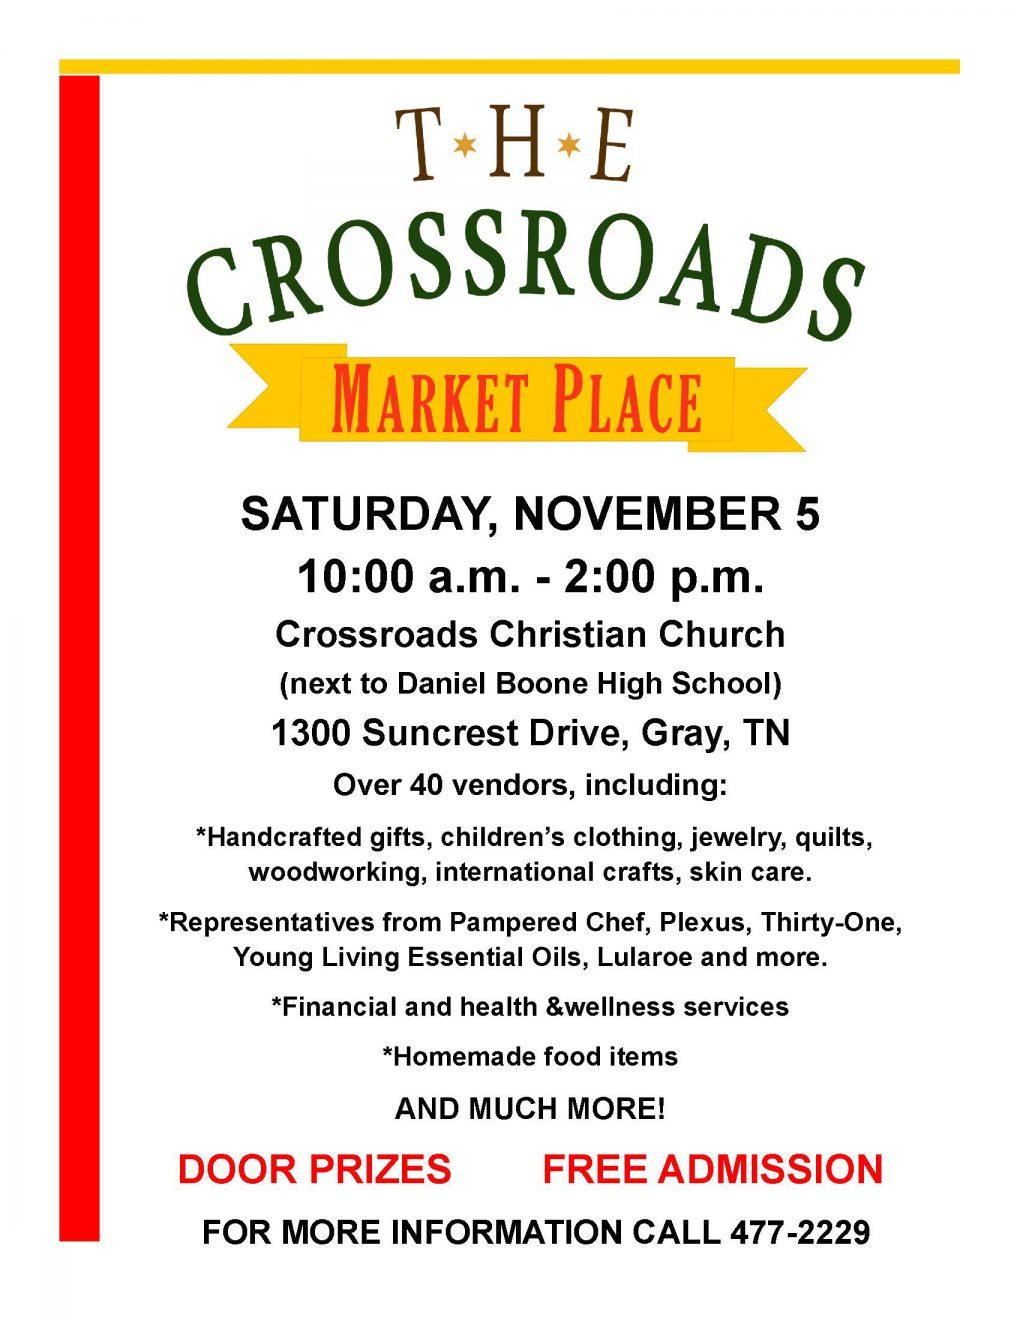 crossroads-marketplace-flyer